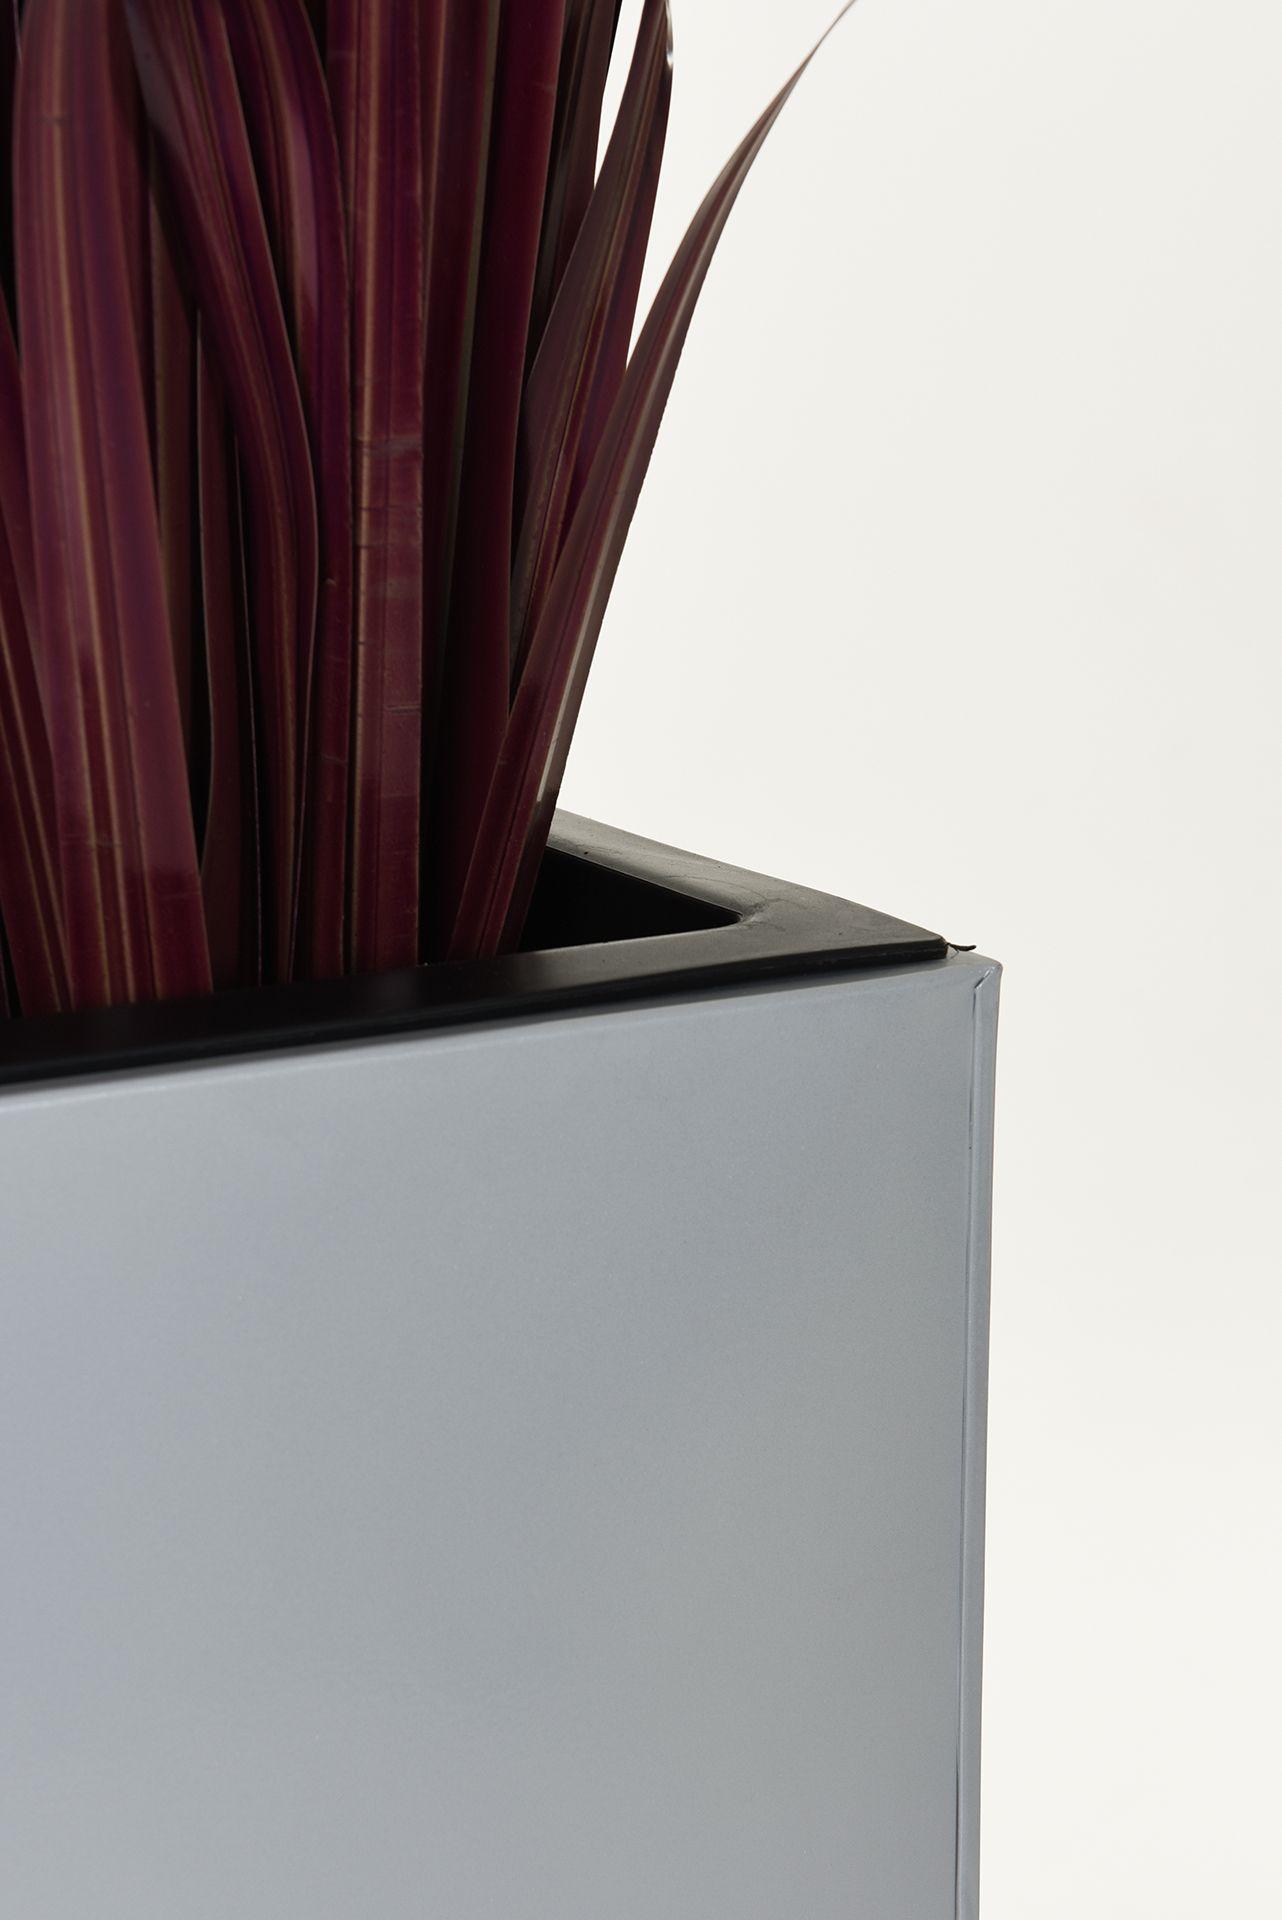 pflanzk bel block 100 cm pulverbeschichtetes stahlblech bew sserungsset grau ebay. Black Bedroom Furniture Sets. Home Design Ideas